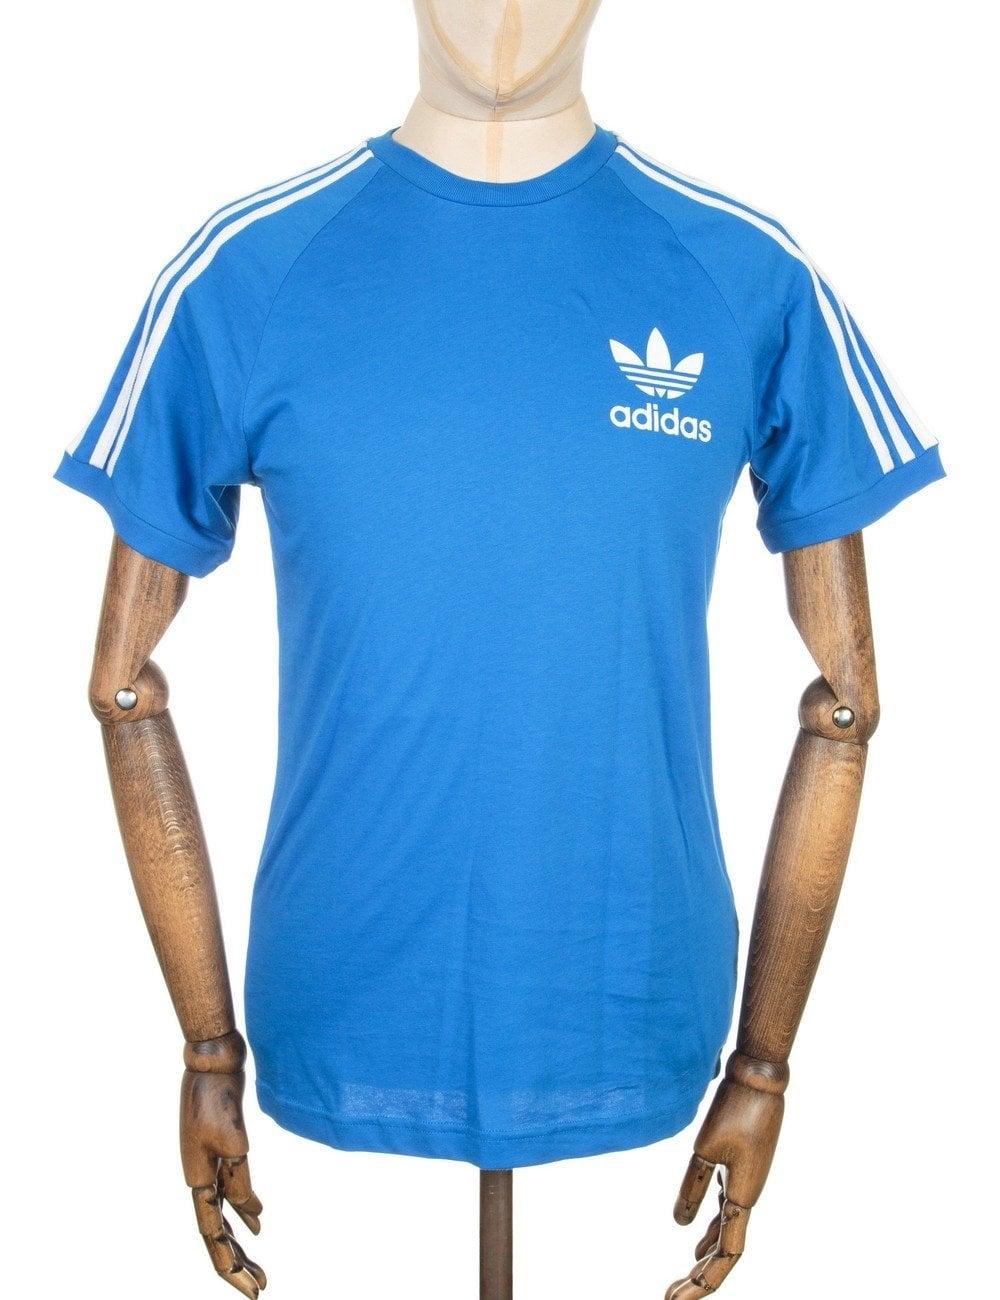 Retro trefoil logo t shirt bluebird clothing from fat for Retro t shirts uk